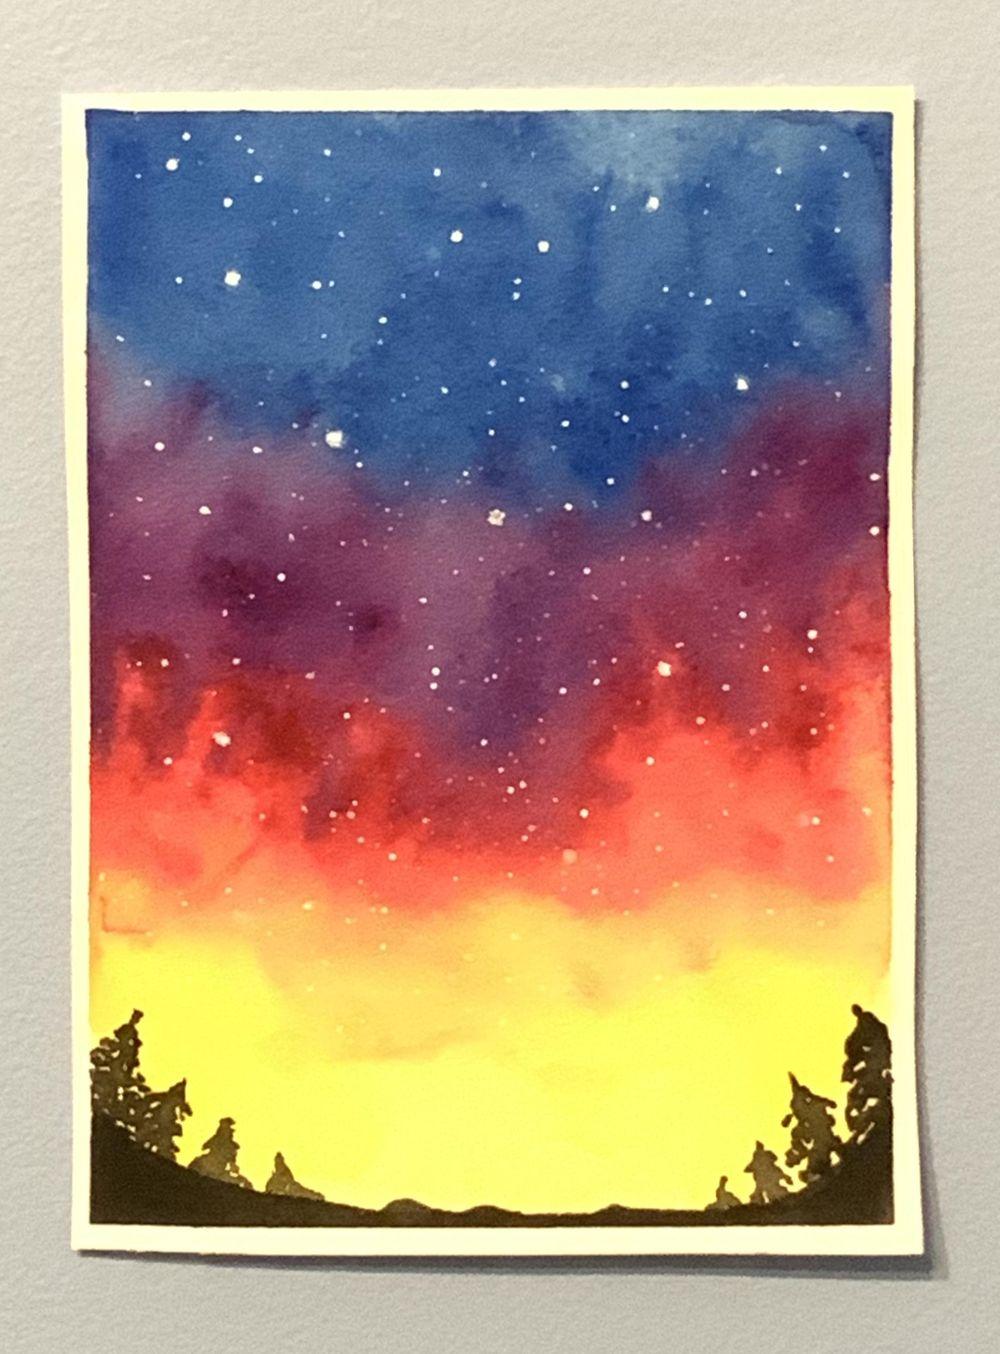 5 beautiful night skies - image 4 - student project